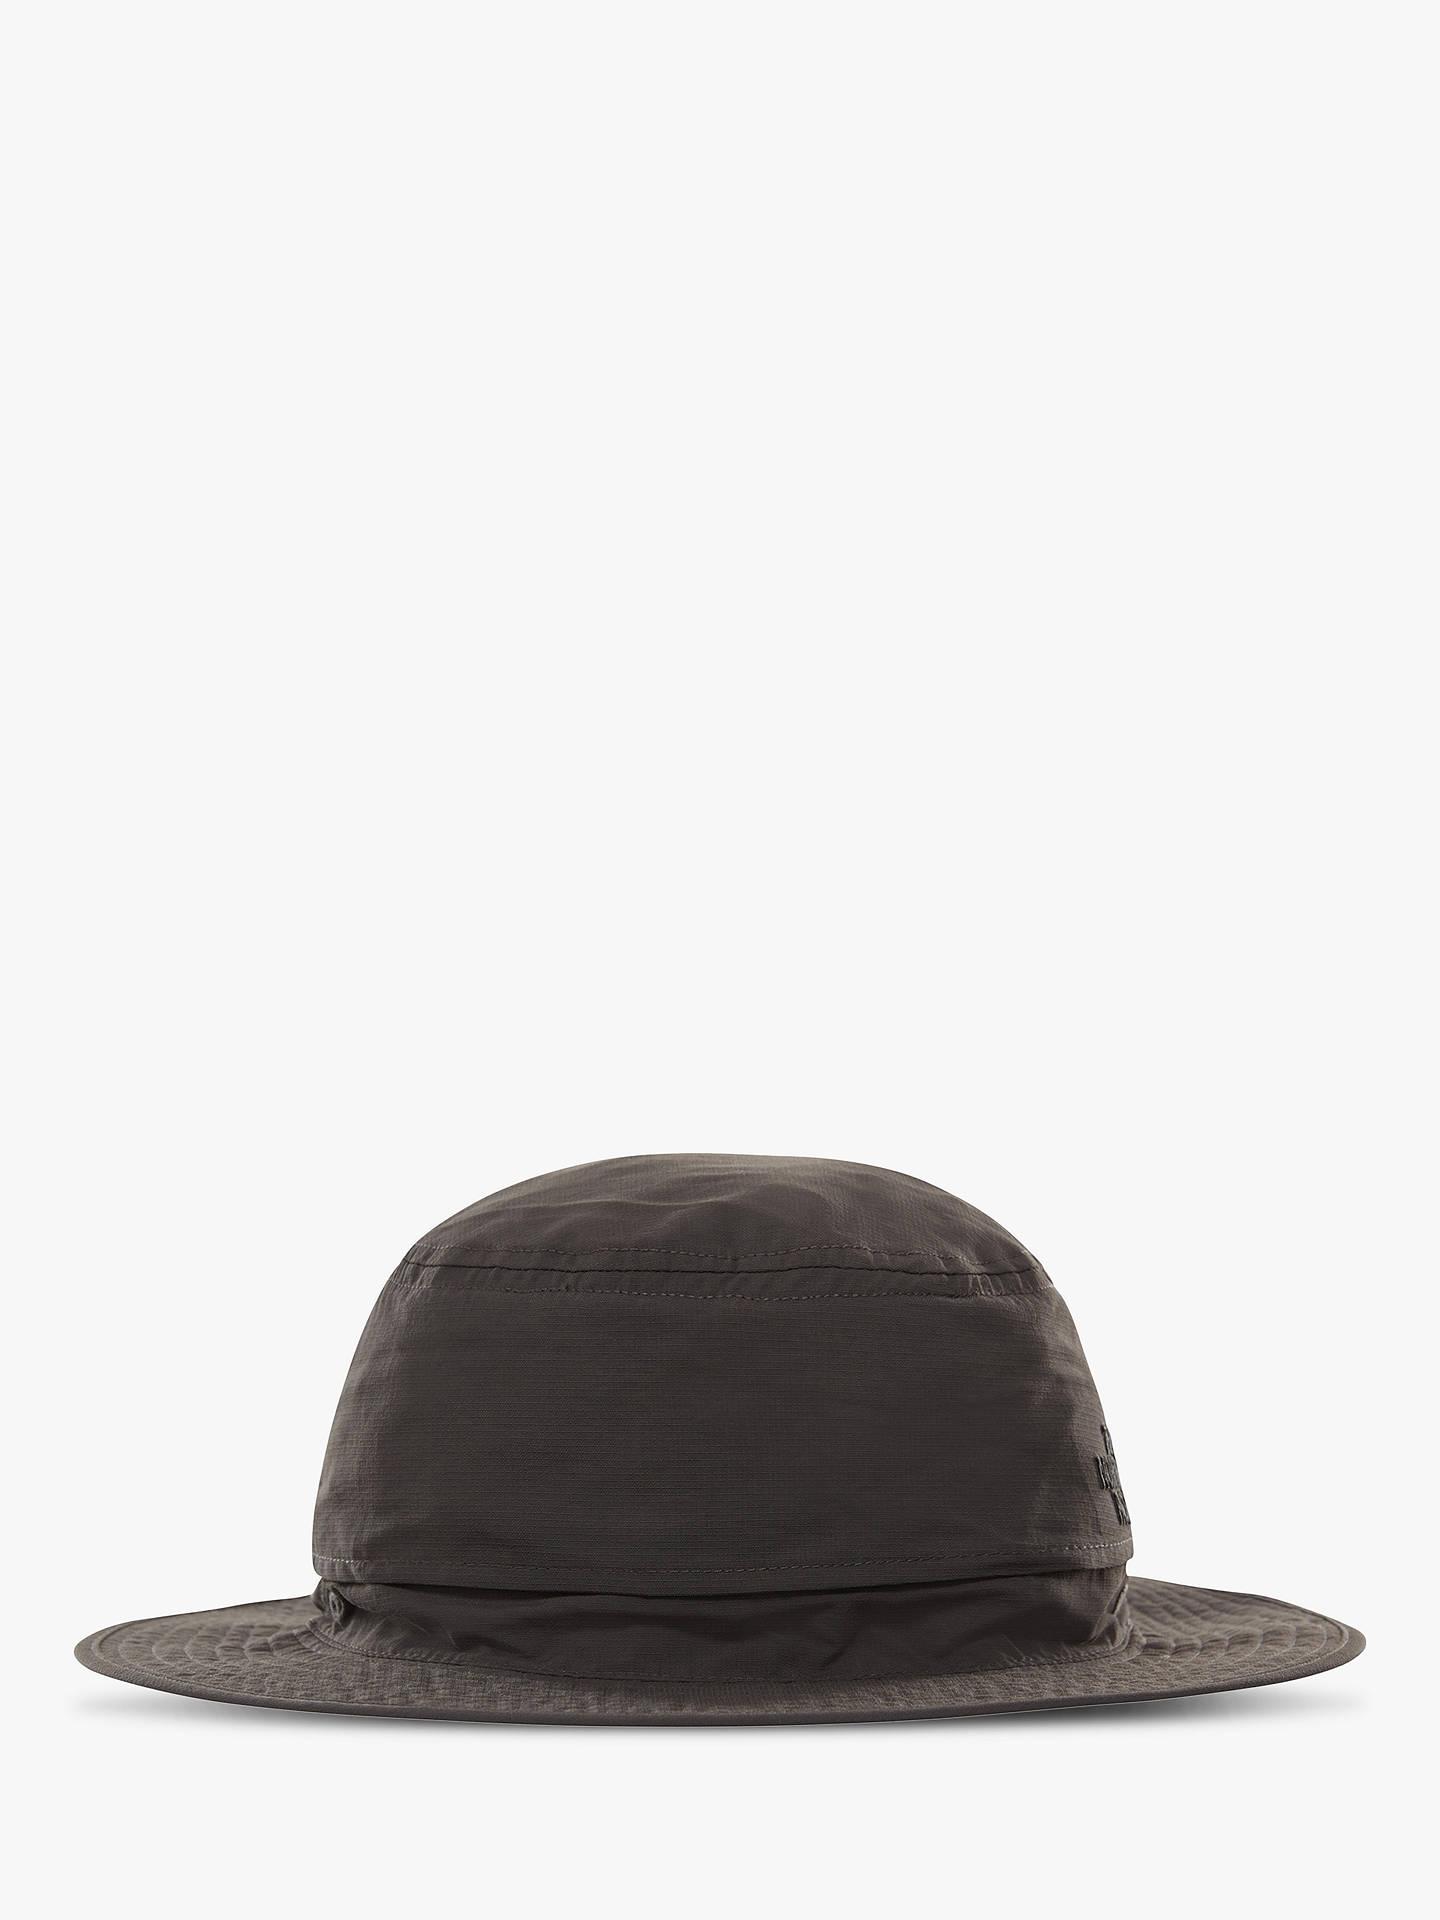 927fad51508dd Buy The North Face Horizon Breeze Brimmer Hat